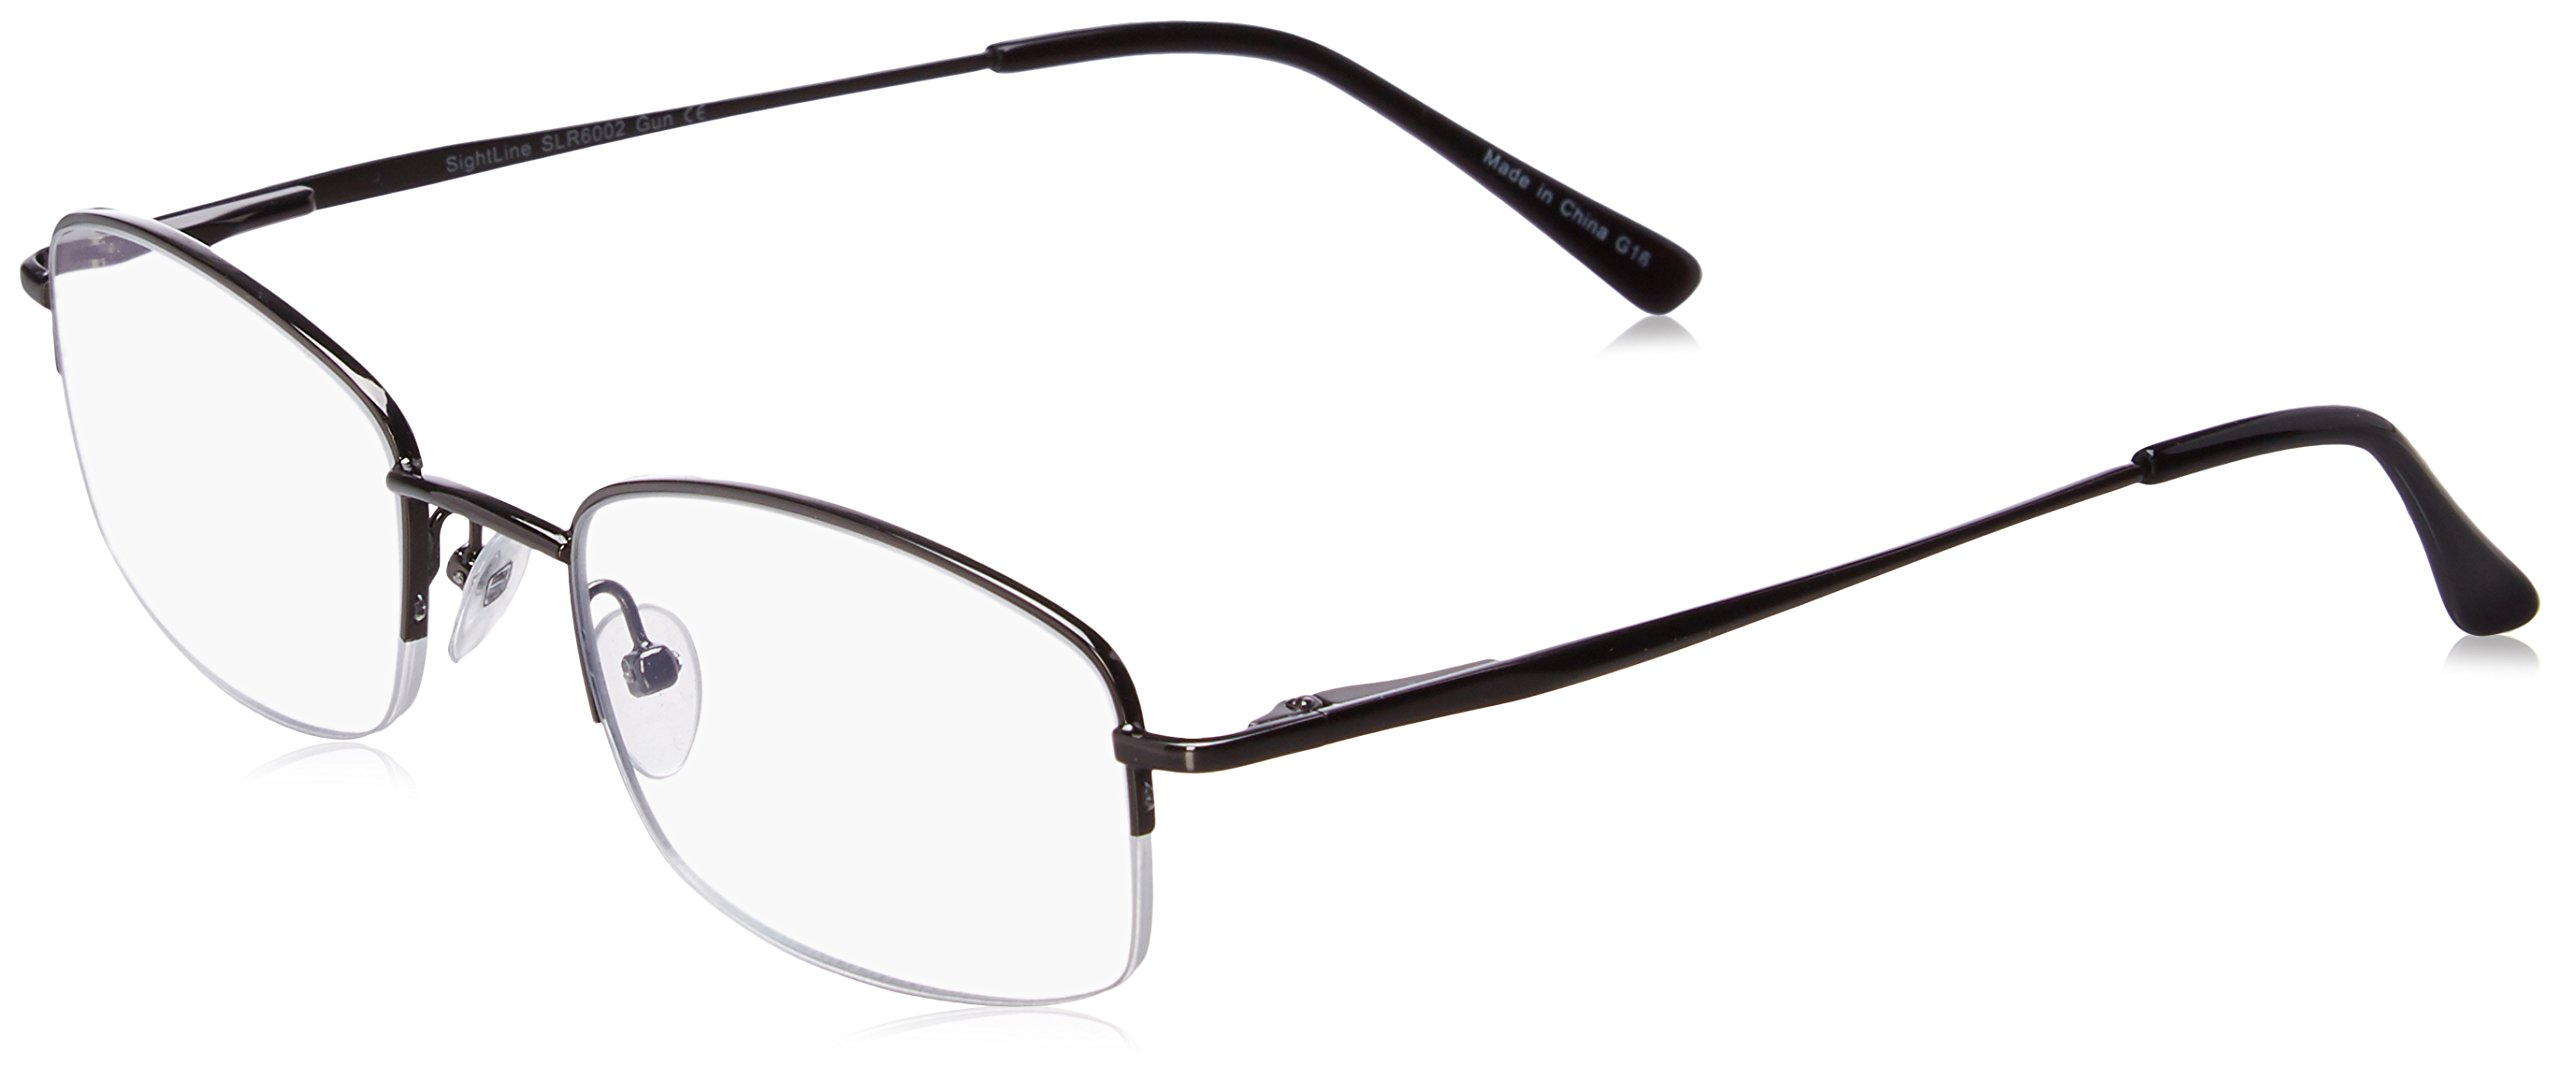 e1d900482f Amazon.com  SightLine Multifocal Computer Reading Glasses 6002 Semi-Rimless  Designer Frames (2.00